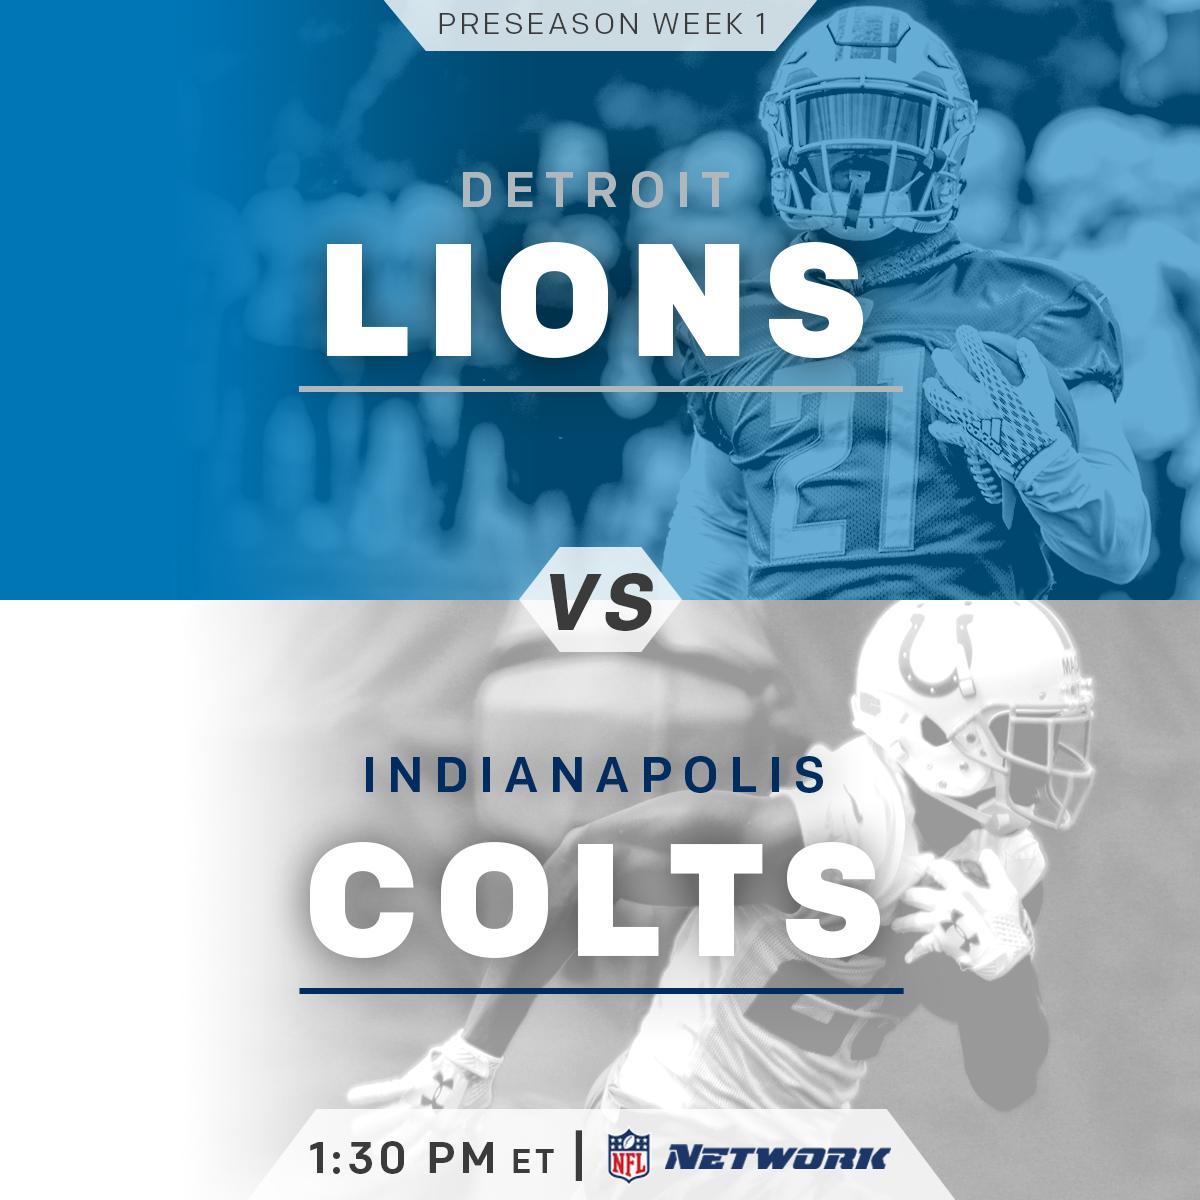 Sunday Football is HERE!  @Lions. @Colts. 1:30pm ET on @nflnetwork! #DETvsIND https://t.co/oK9sUIOaLt